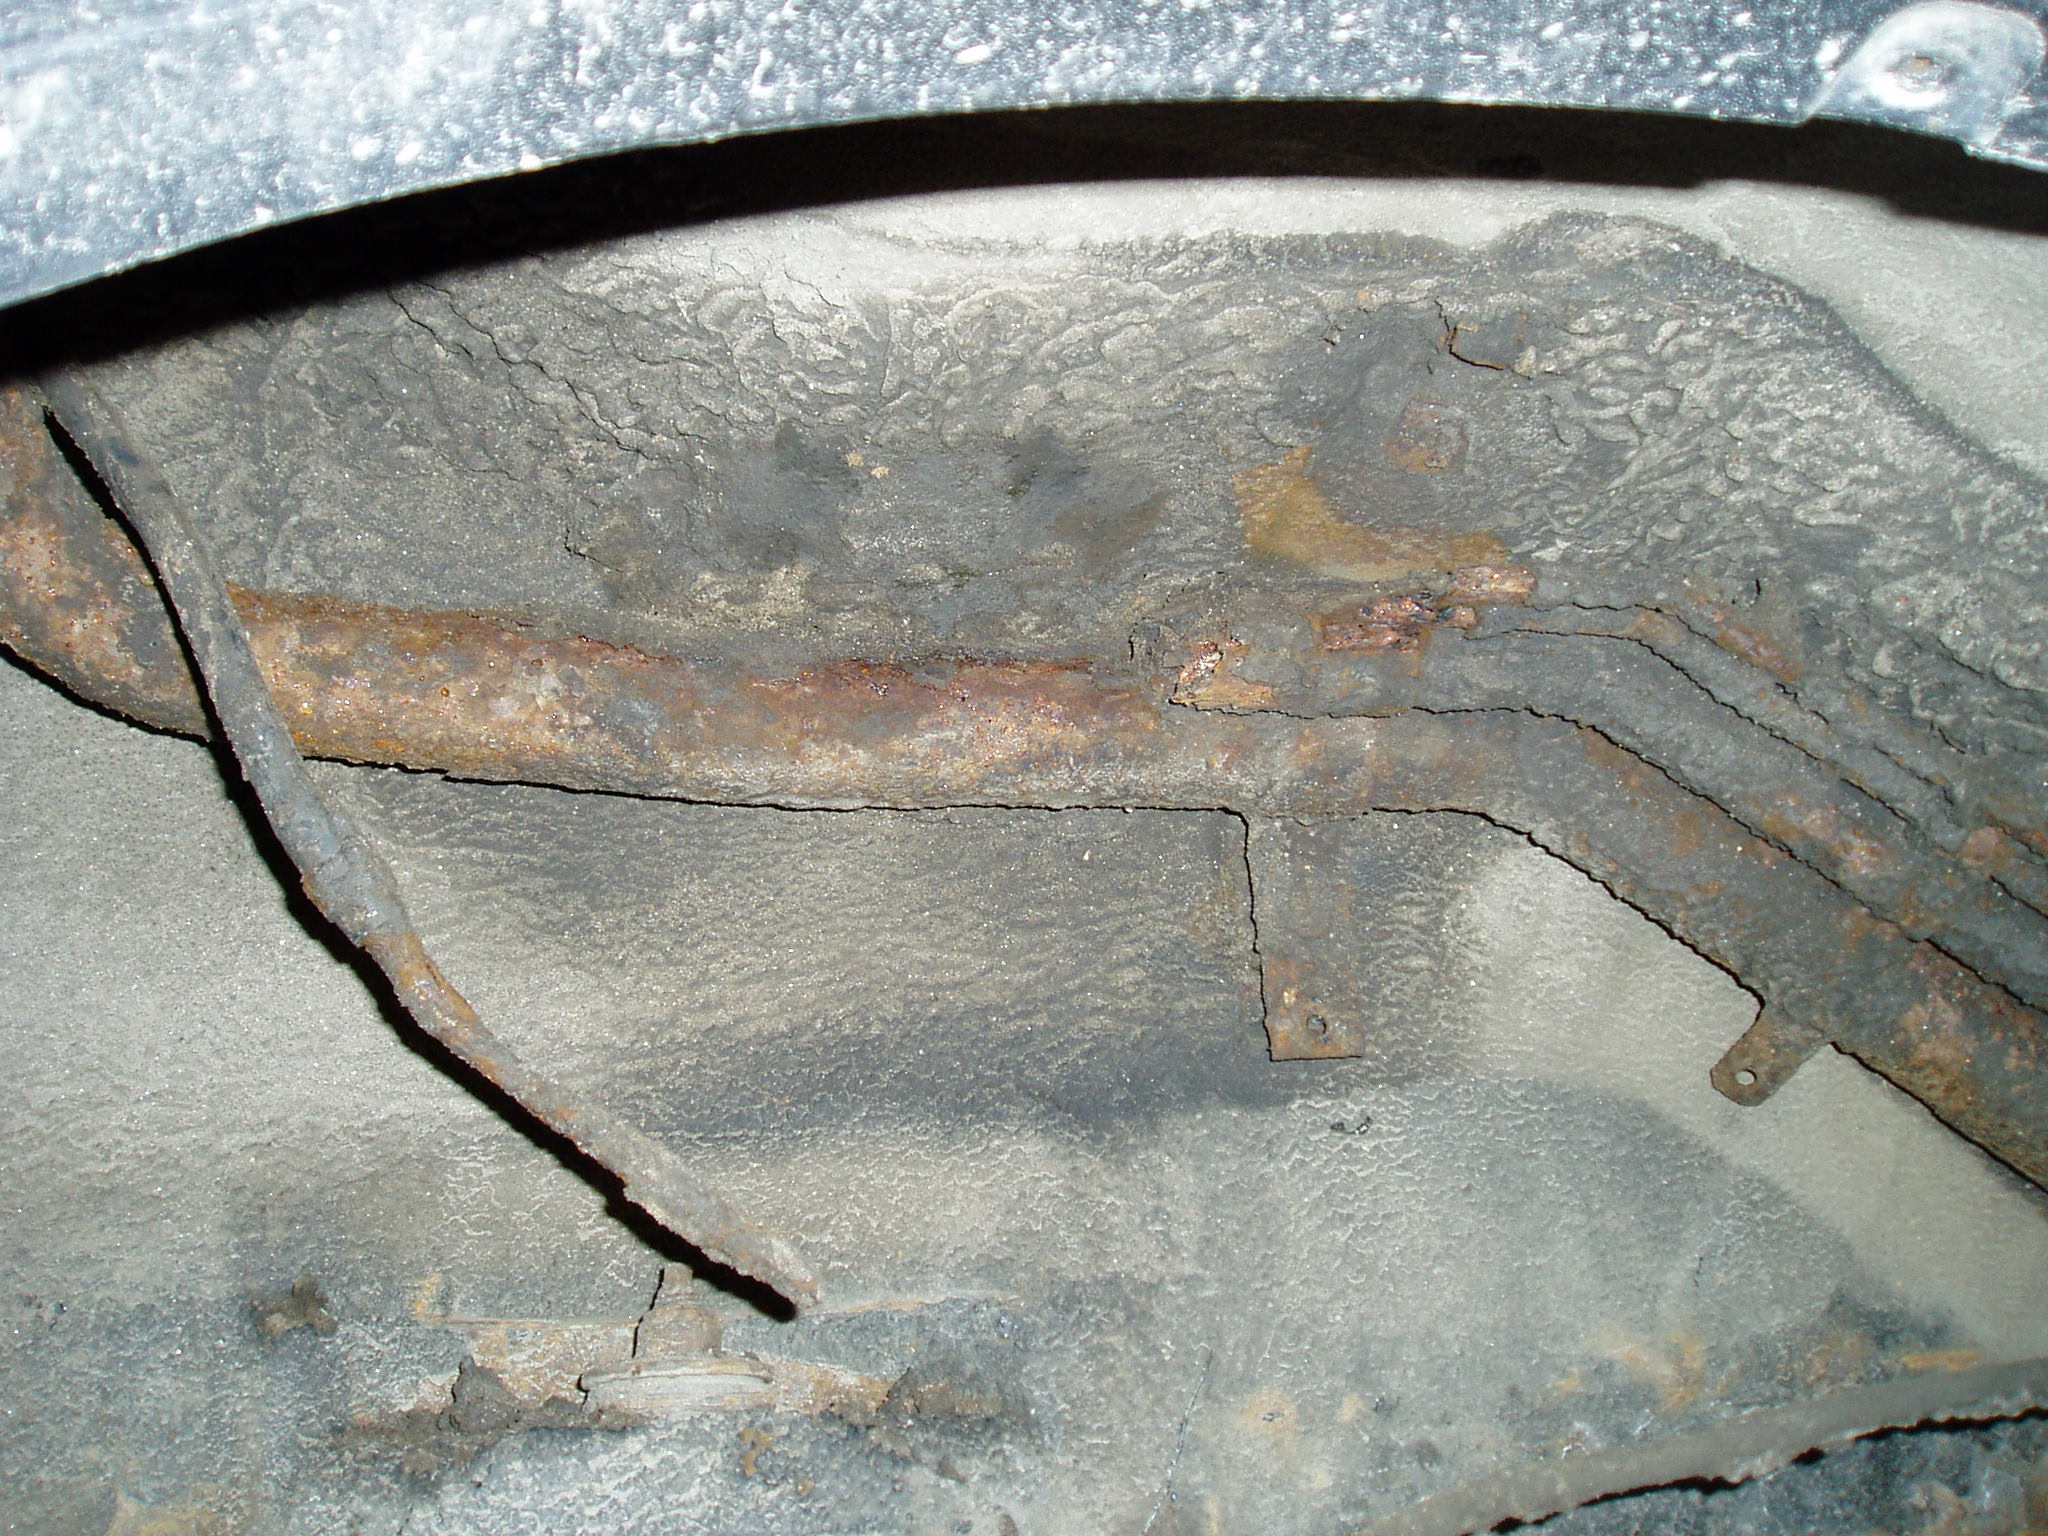 Проржавела топливозаливная горловина Mitsubishi Montero 3. Последствия